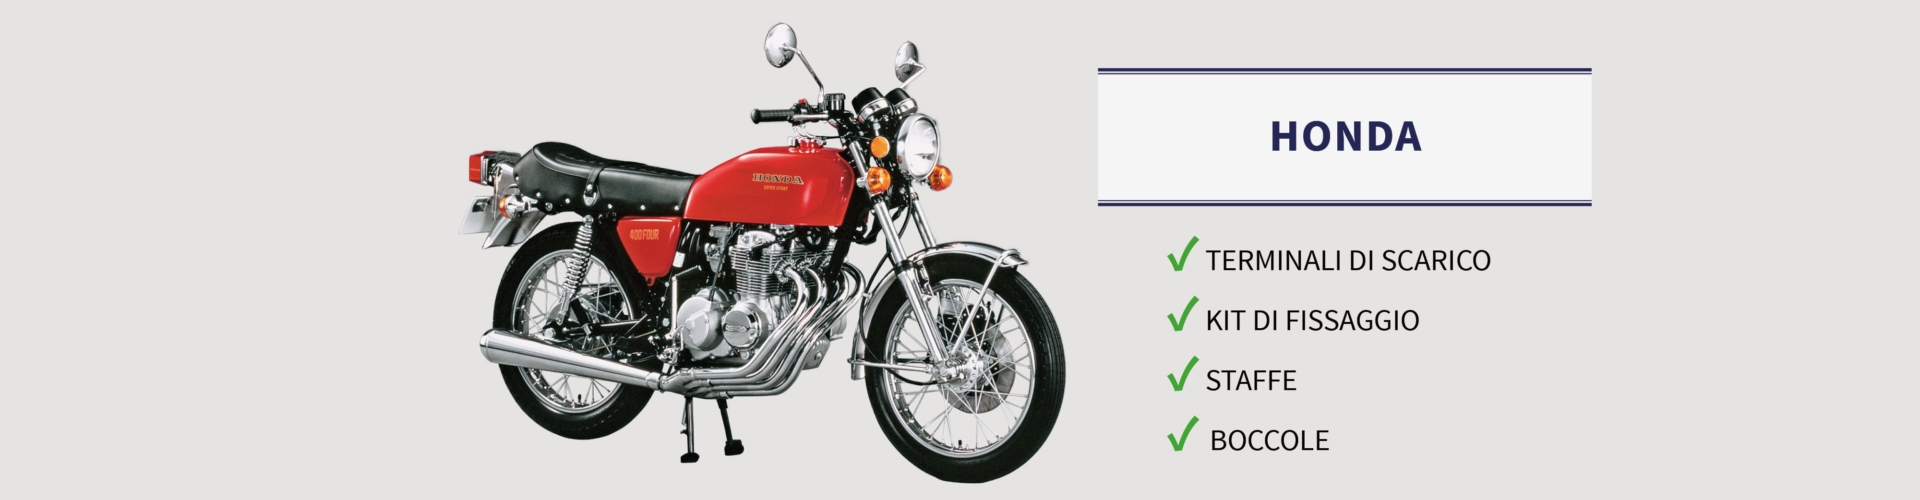 moto-storiche-italiane-terminali-moto-epoca-honda-four-400-rid